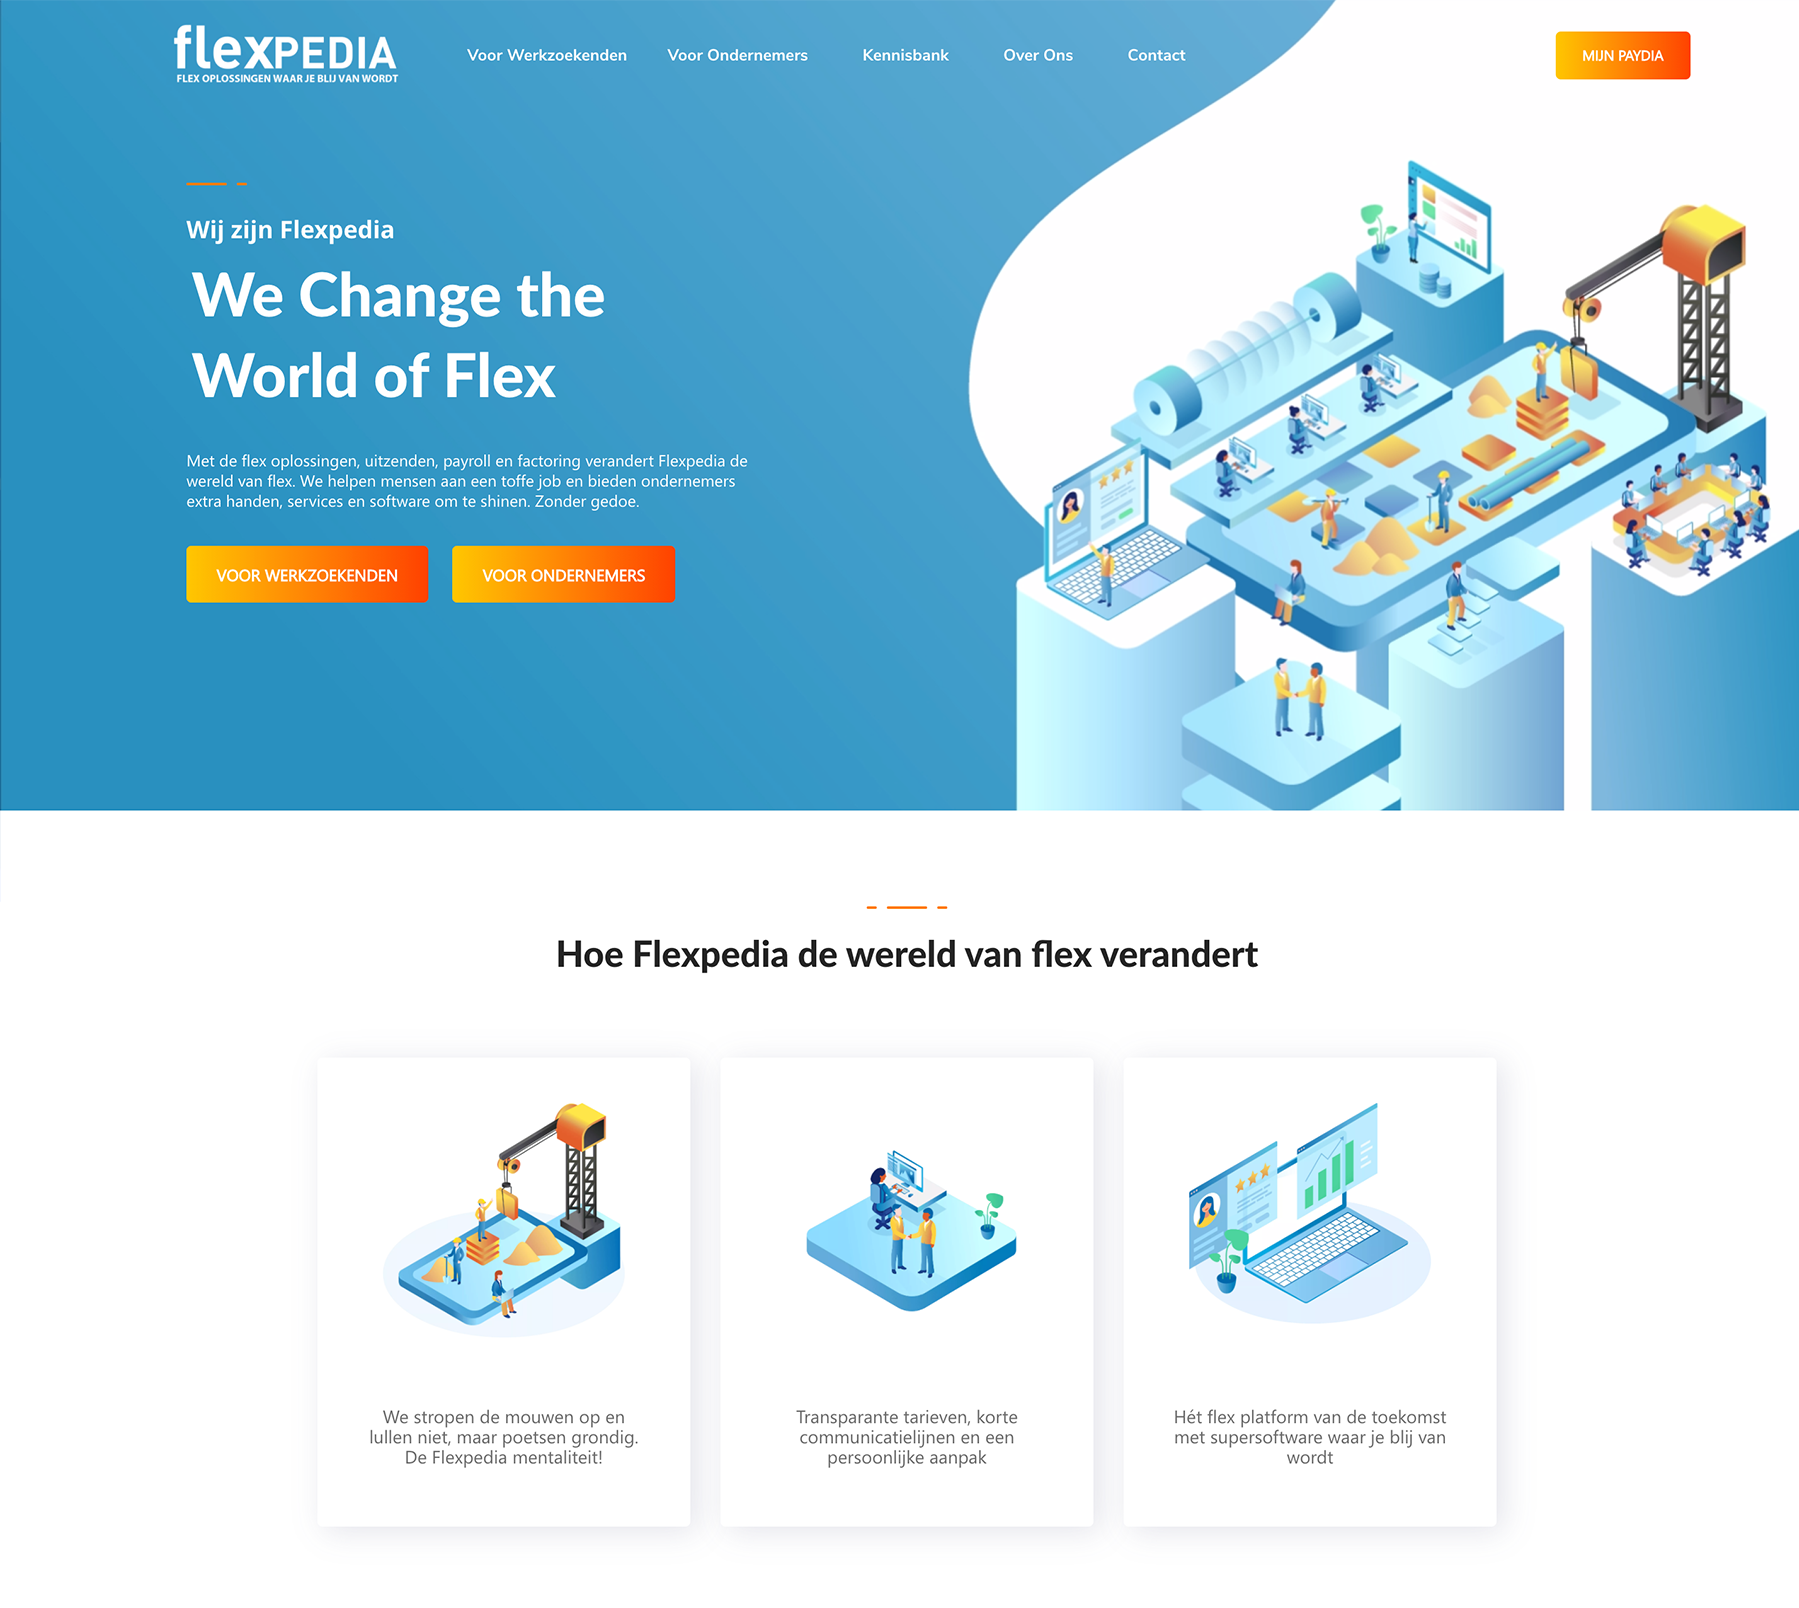 flexpedia.nl